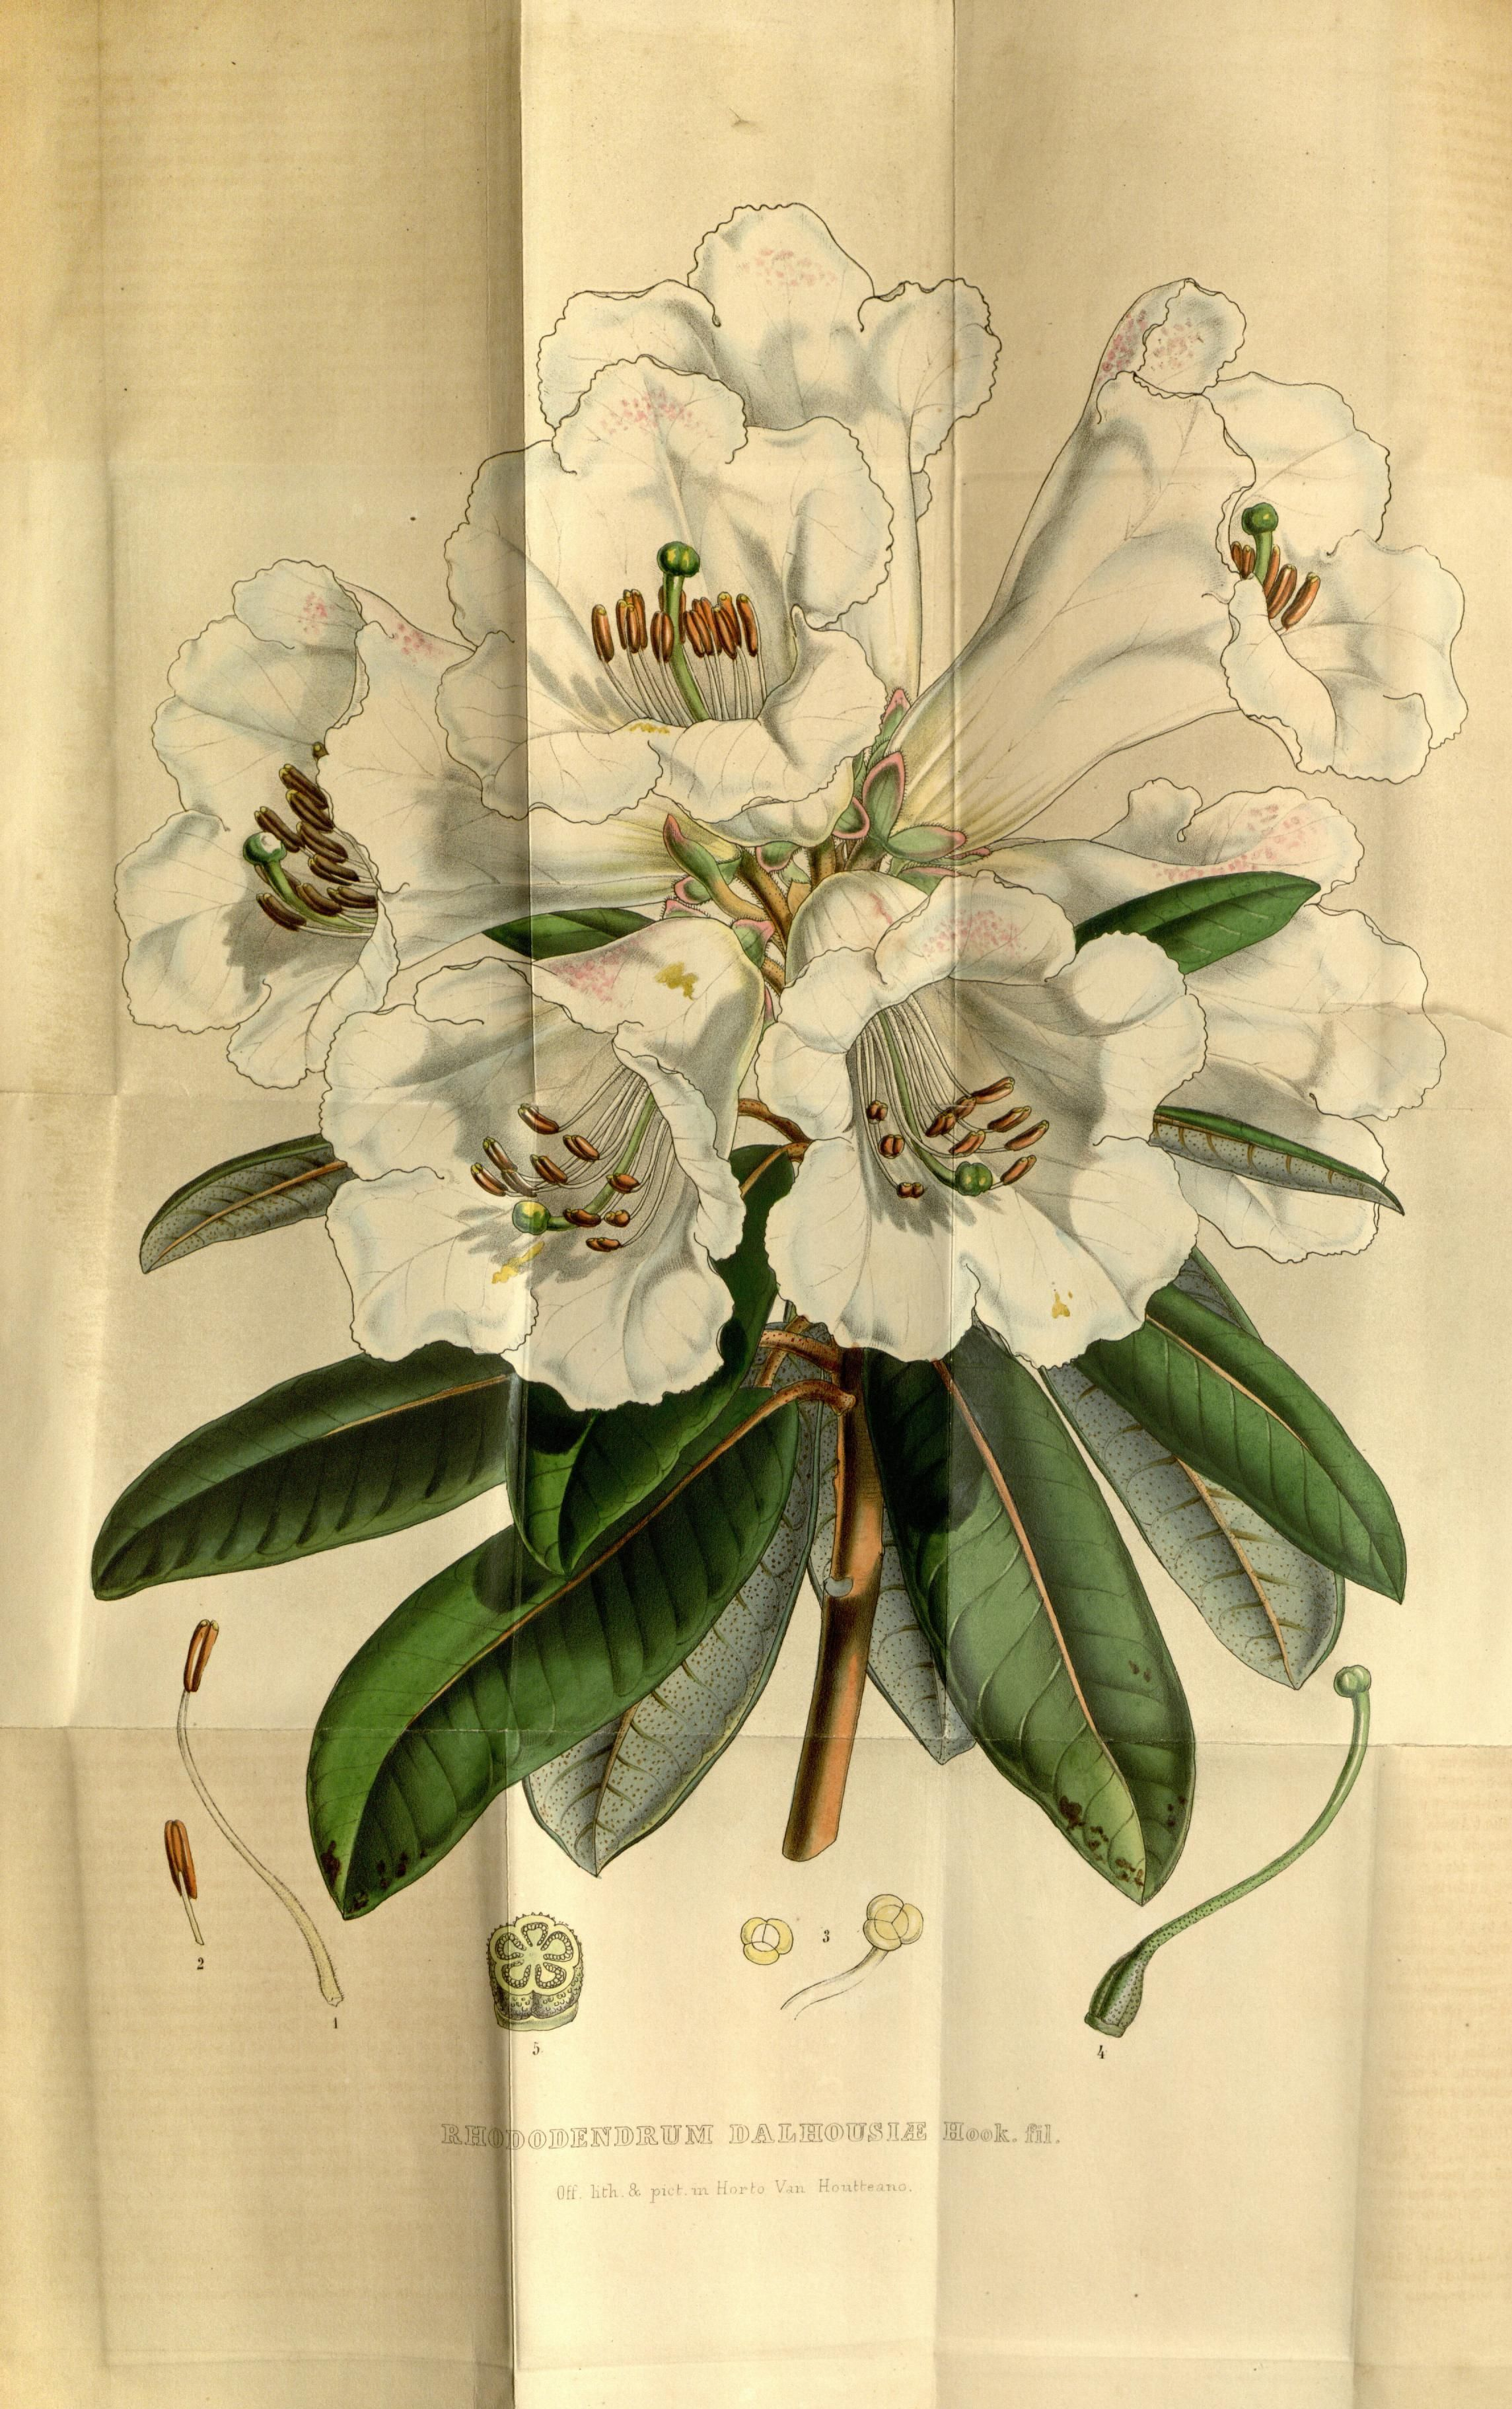 Rhododendron dalhouslæ Hook. fil.